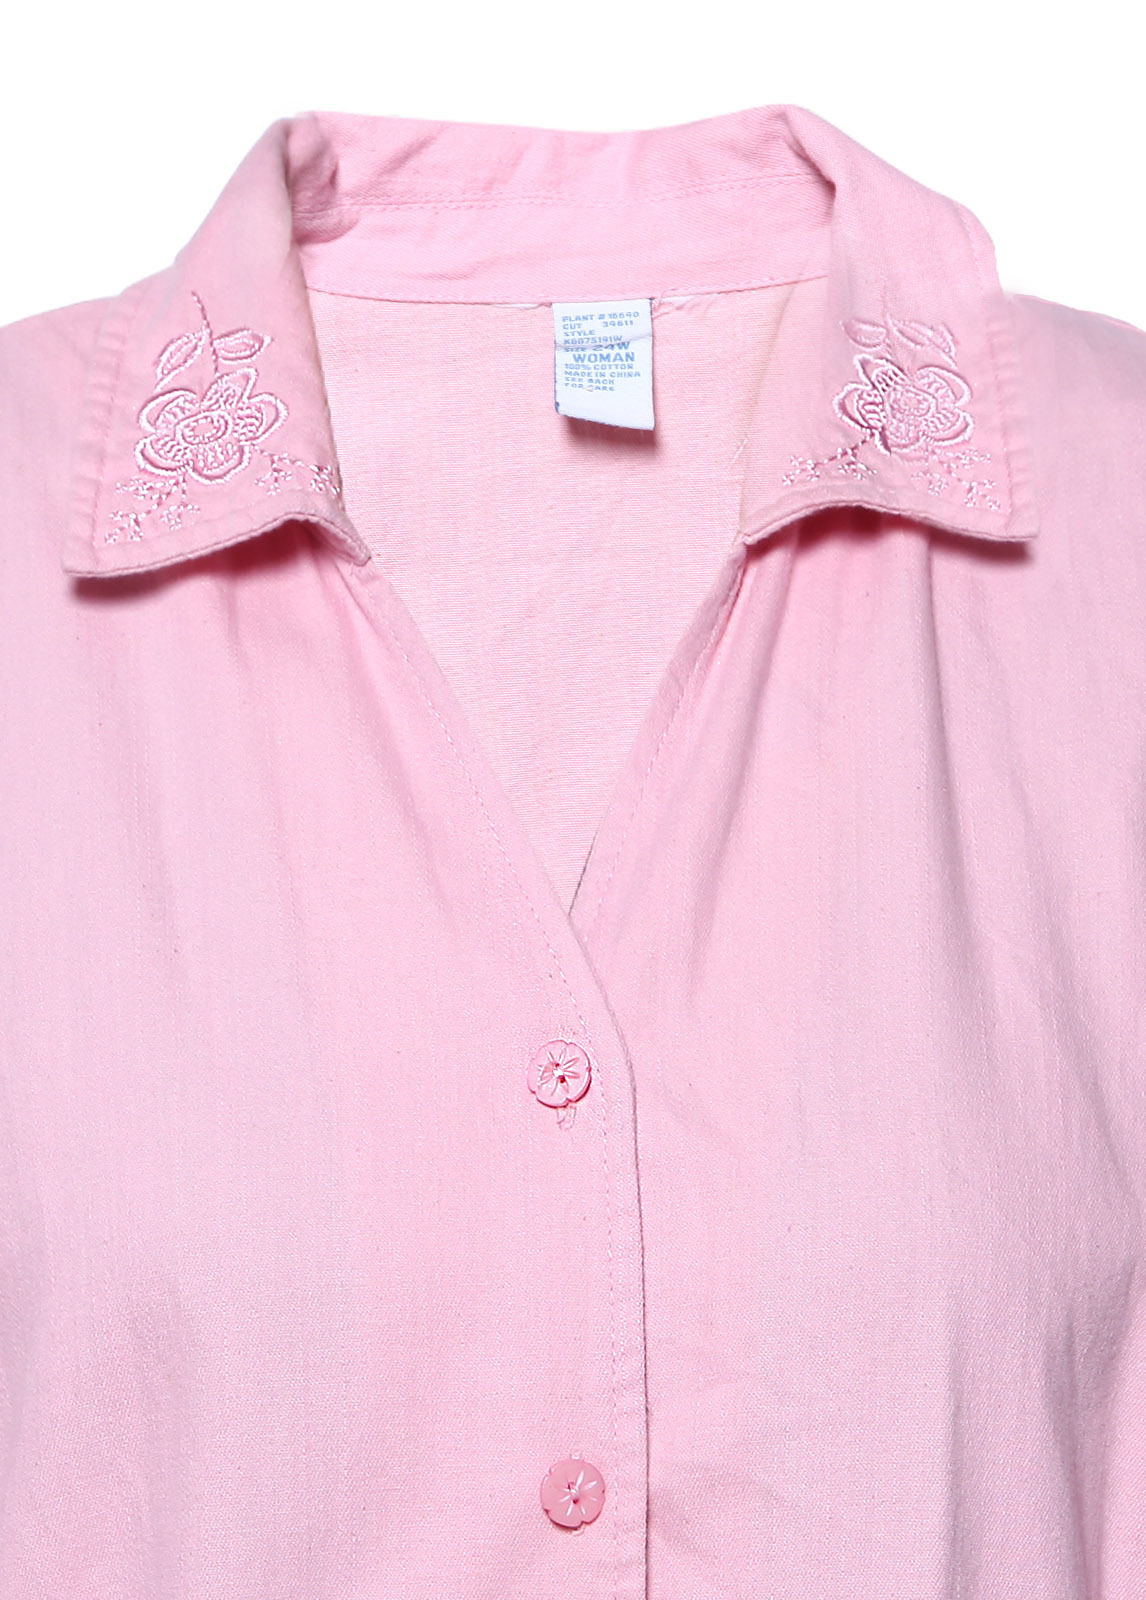 Cotton Women Short Sleeve Shirts Blouse Button Tops Home